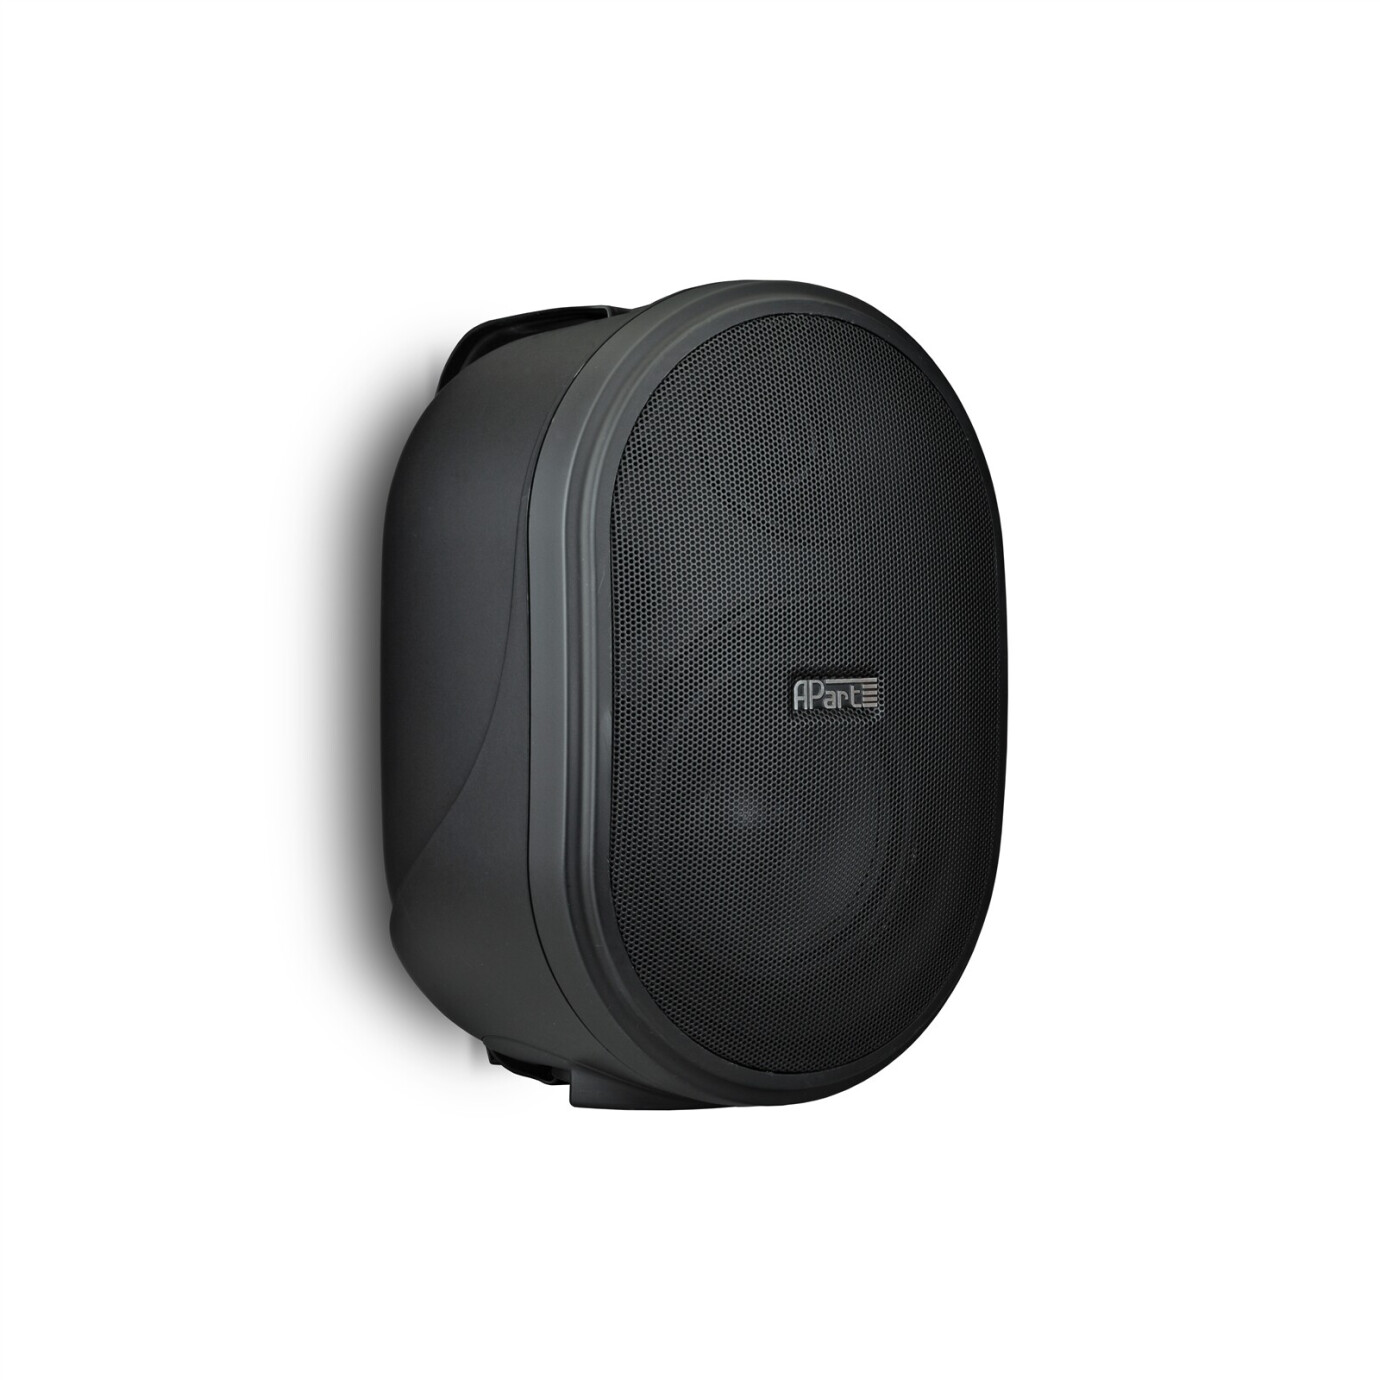 APart OVO5T-B speaker / 1 pair - 80 W/100 V - Black